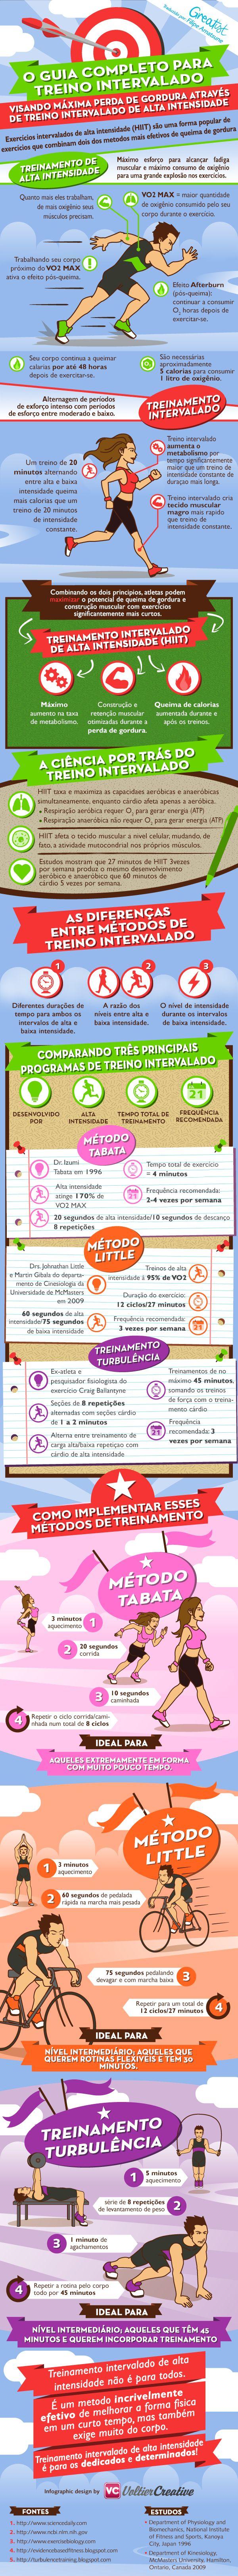 infográfico_hiit